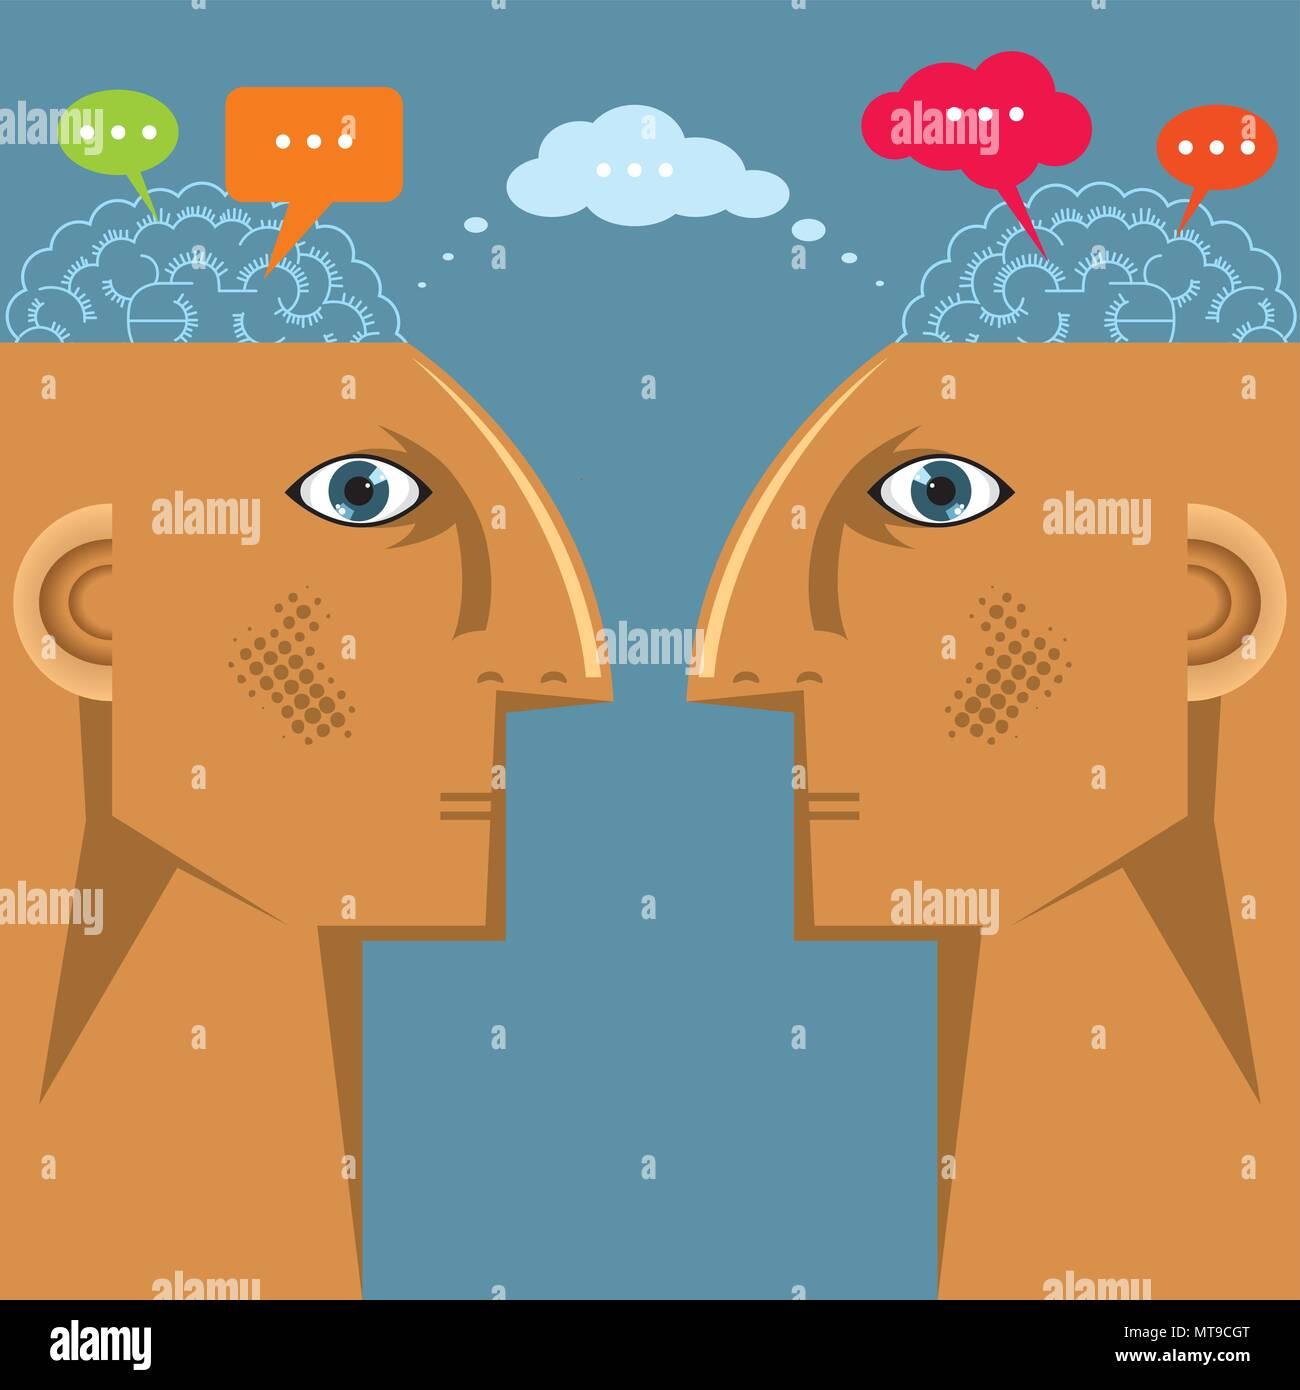 Face to face kommunikation